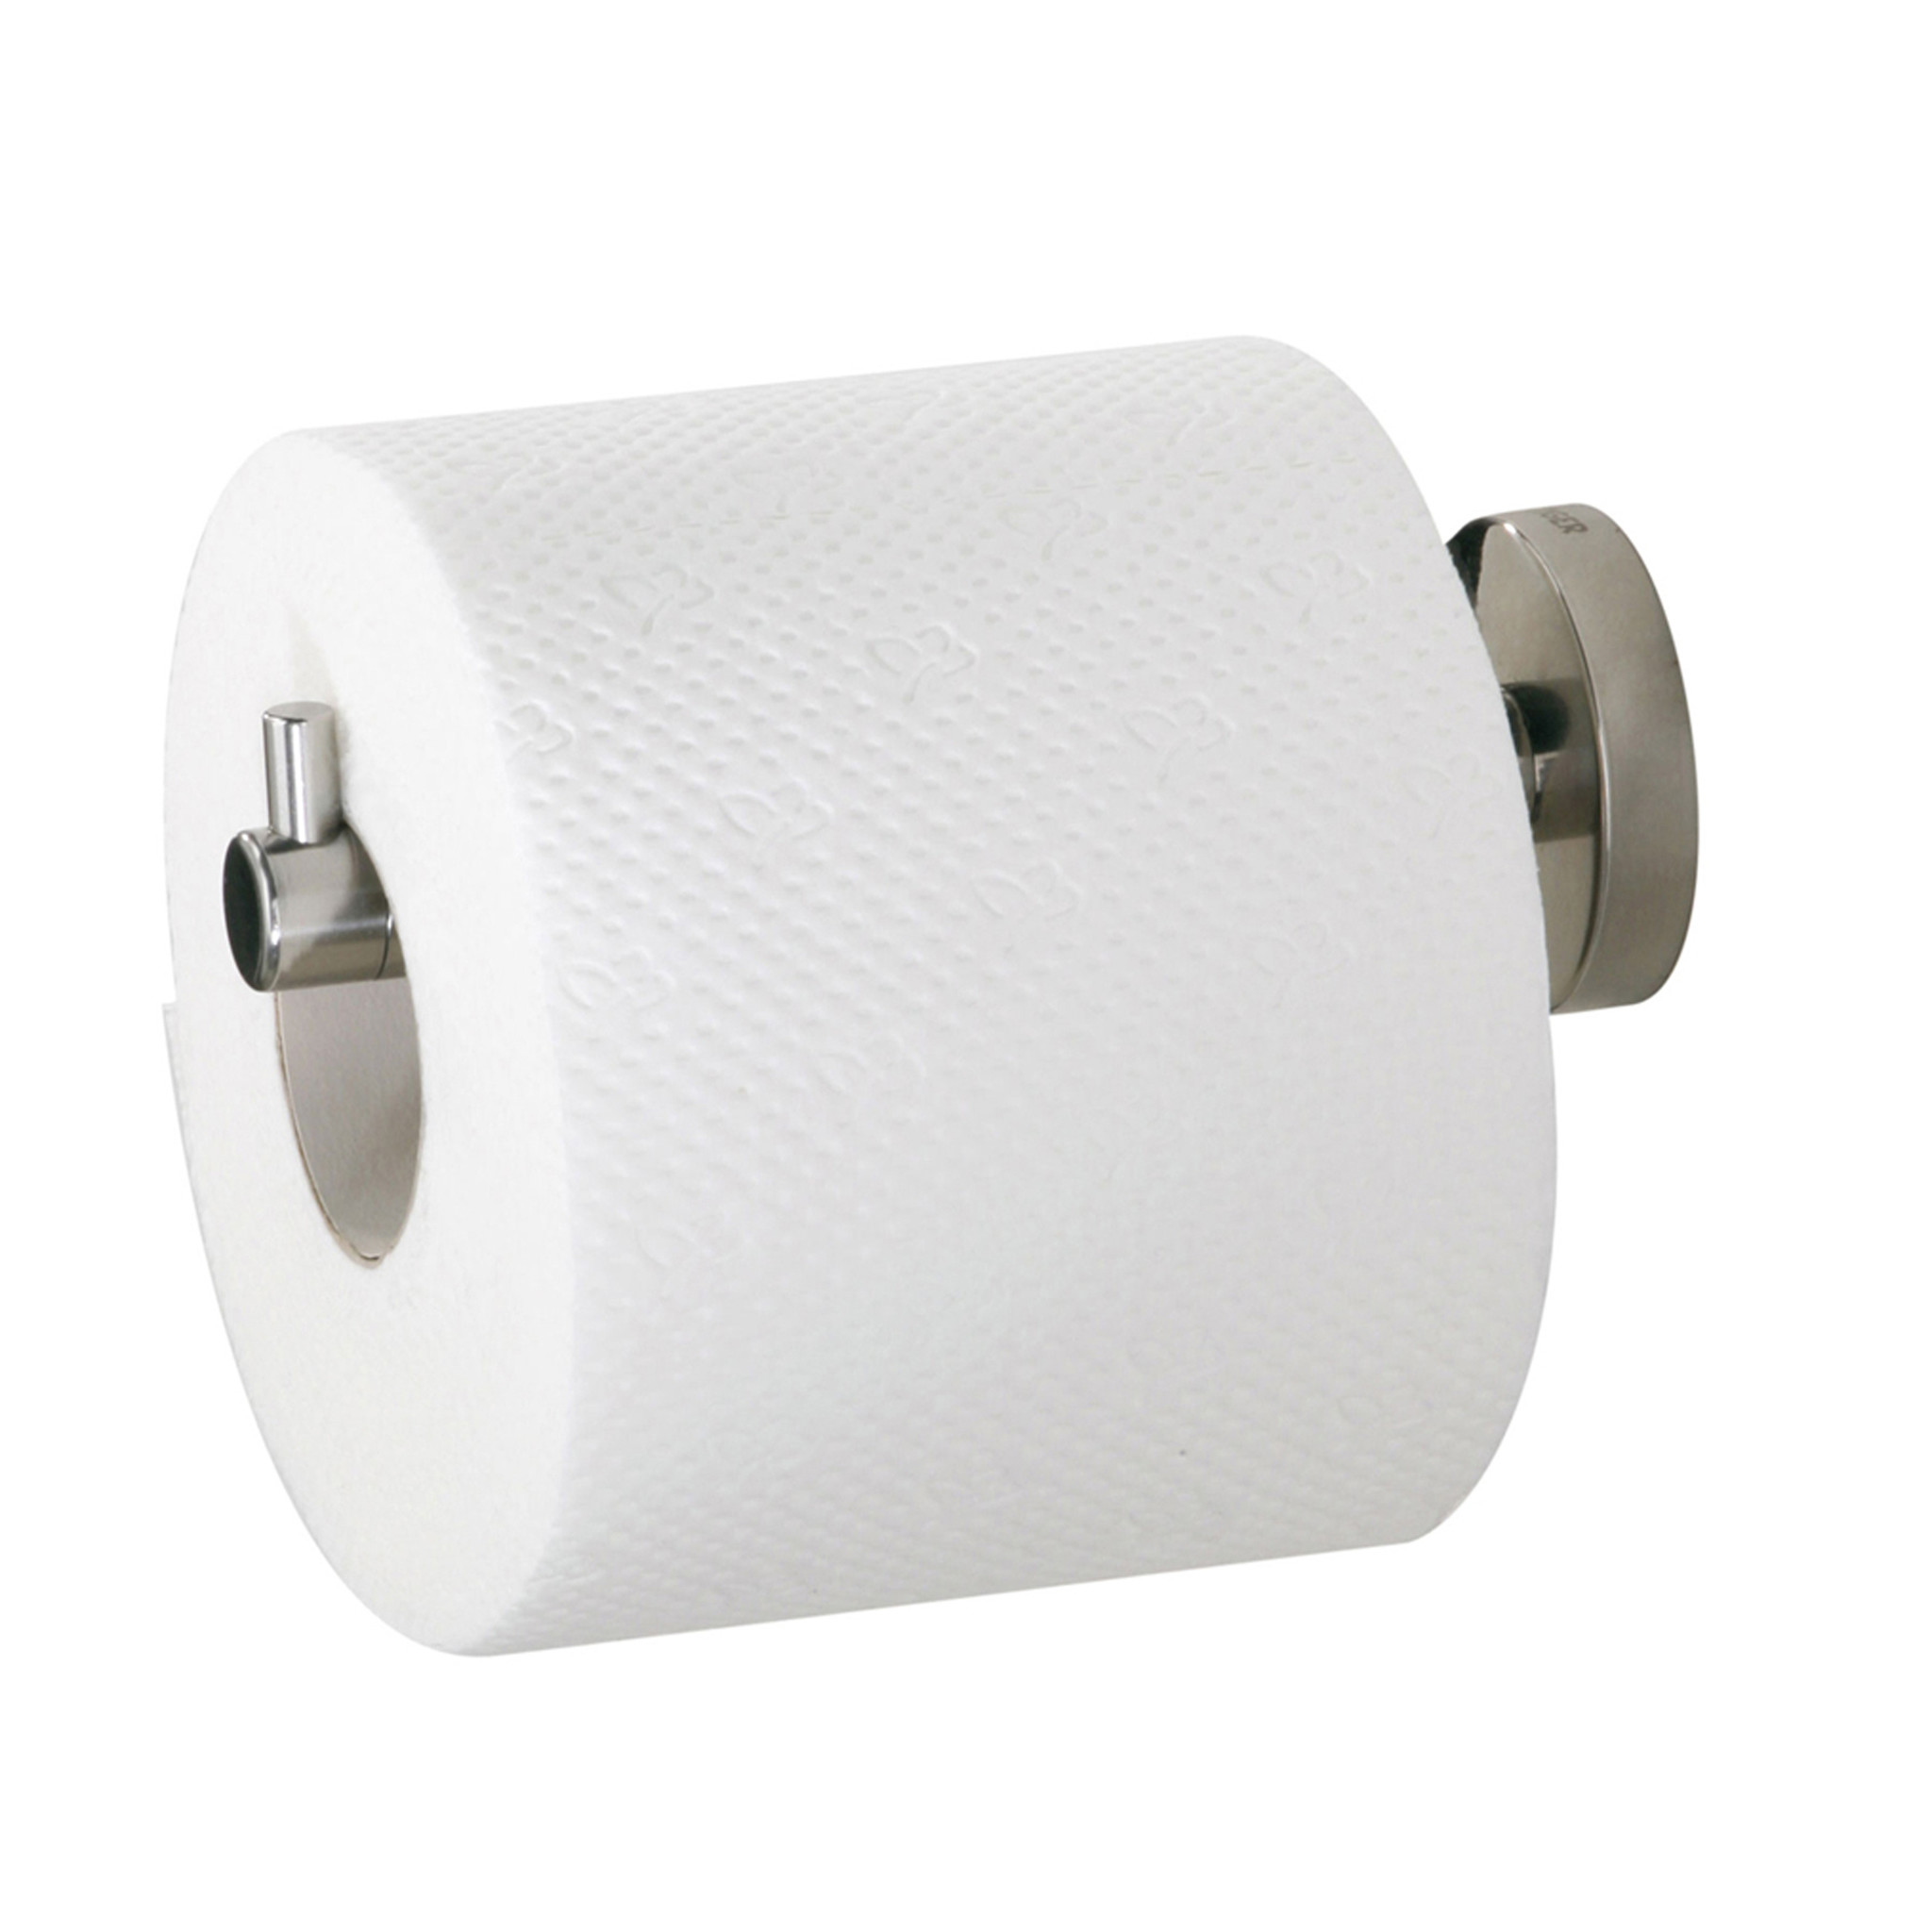 Tiger Boston Spare Toilet Roll Holder